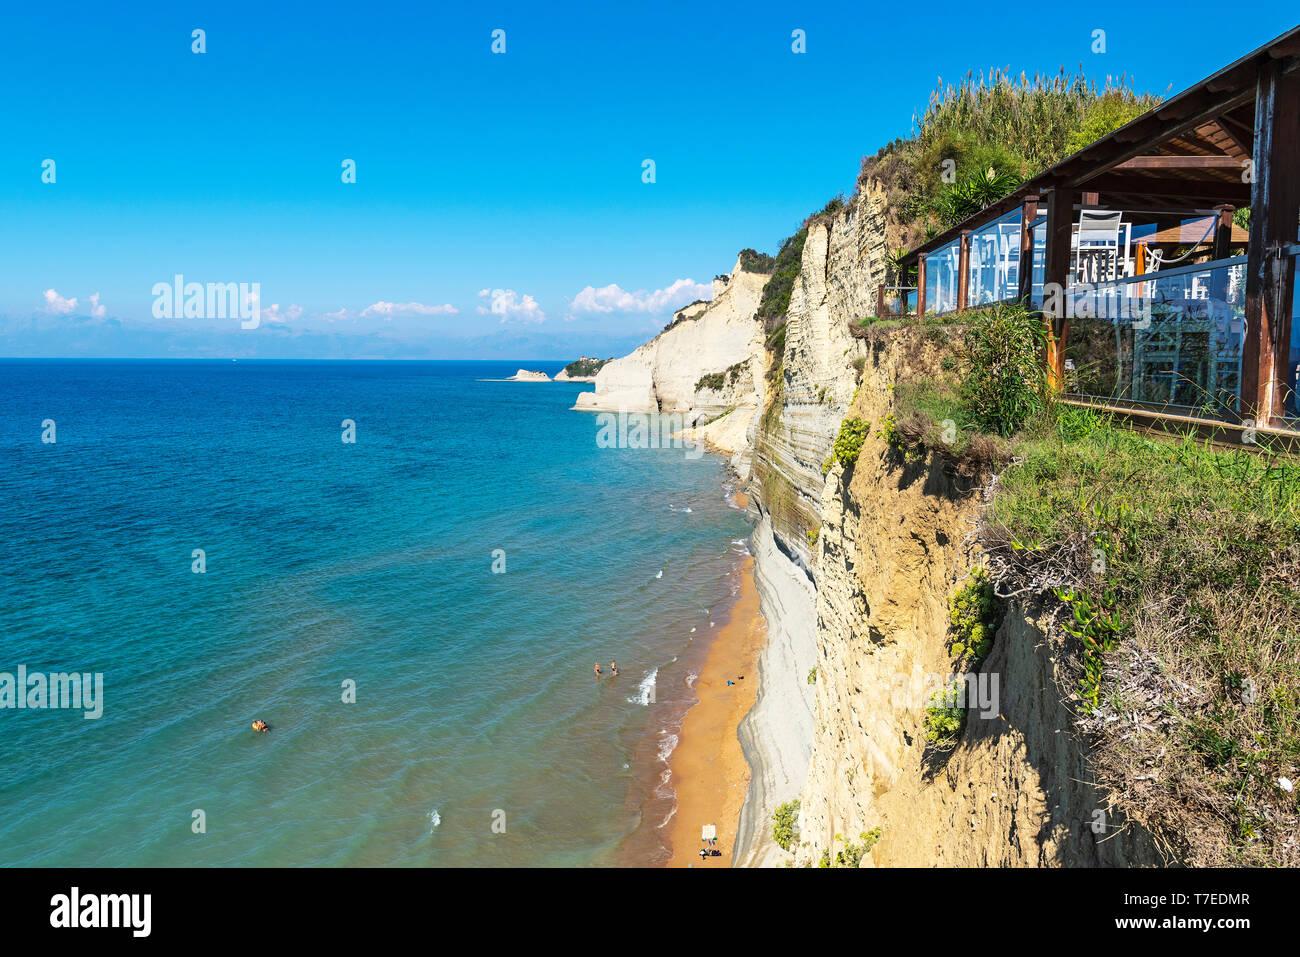 Sunset Bar, Logas Beach, Logas, Peroulades, Corfu Island, Ionian Islands, Mediterranean Sea, Greece - Stock Image